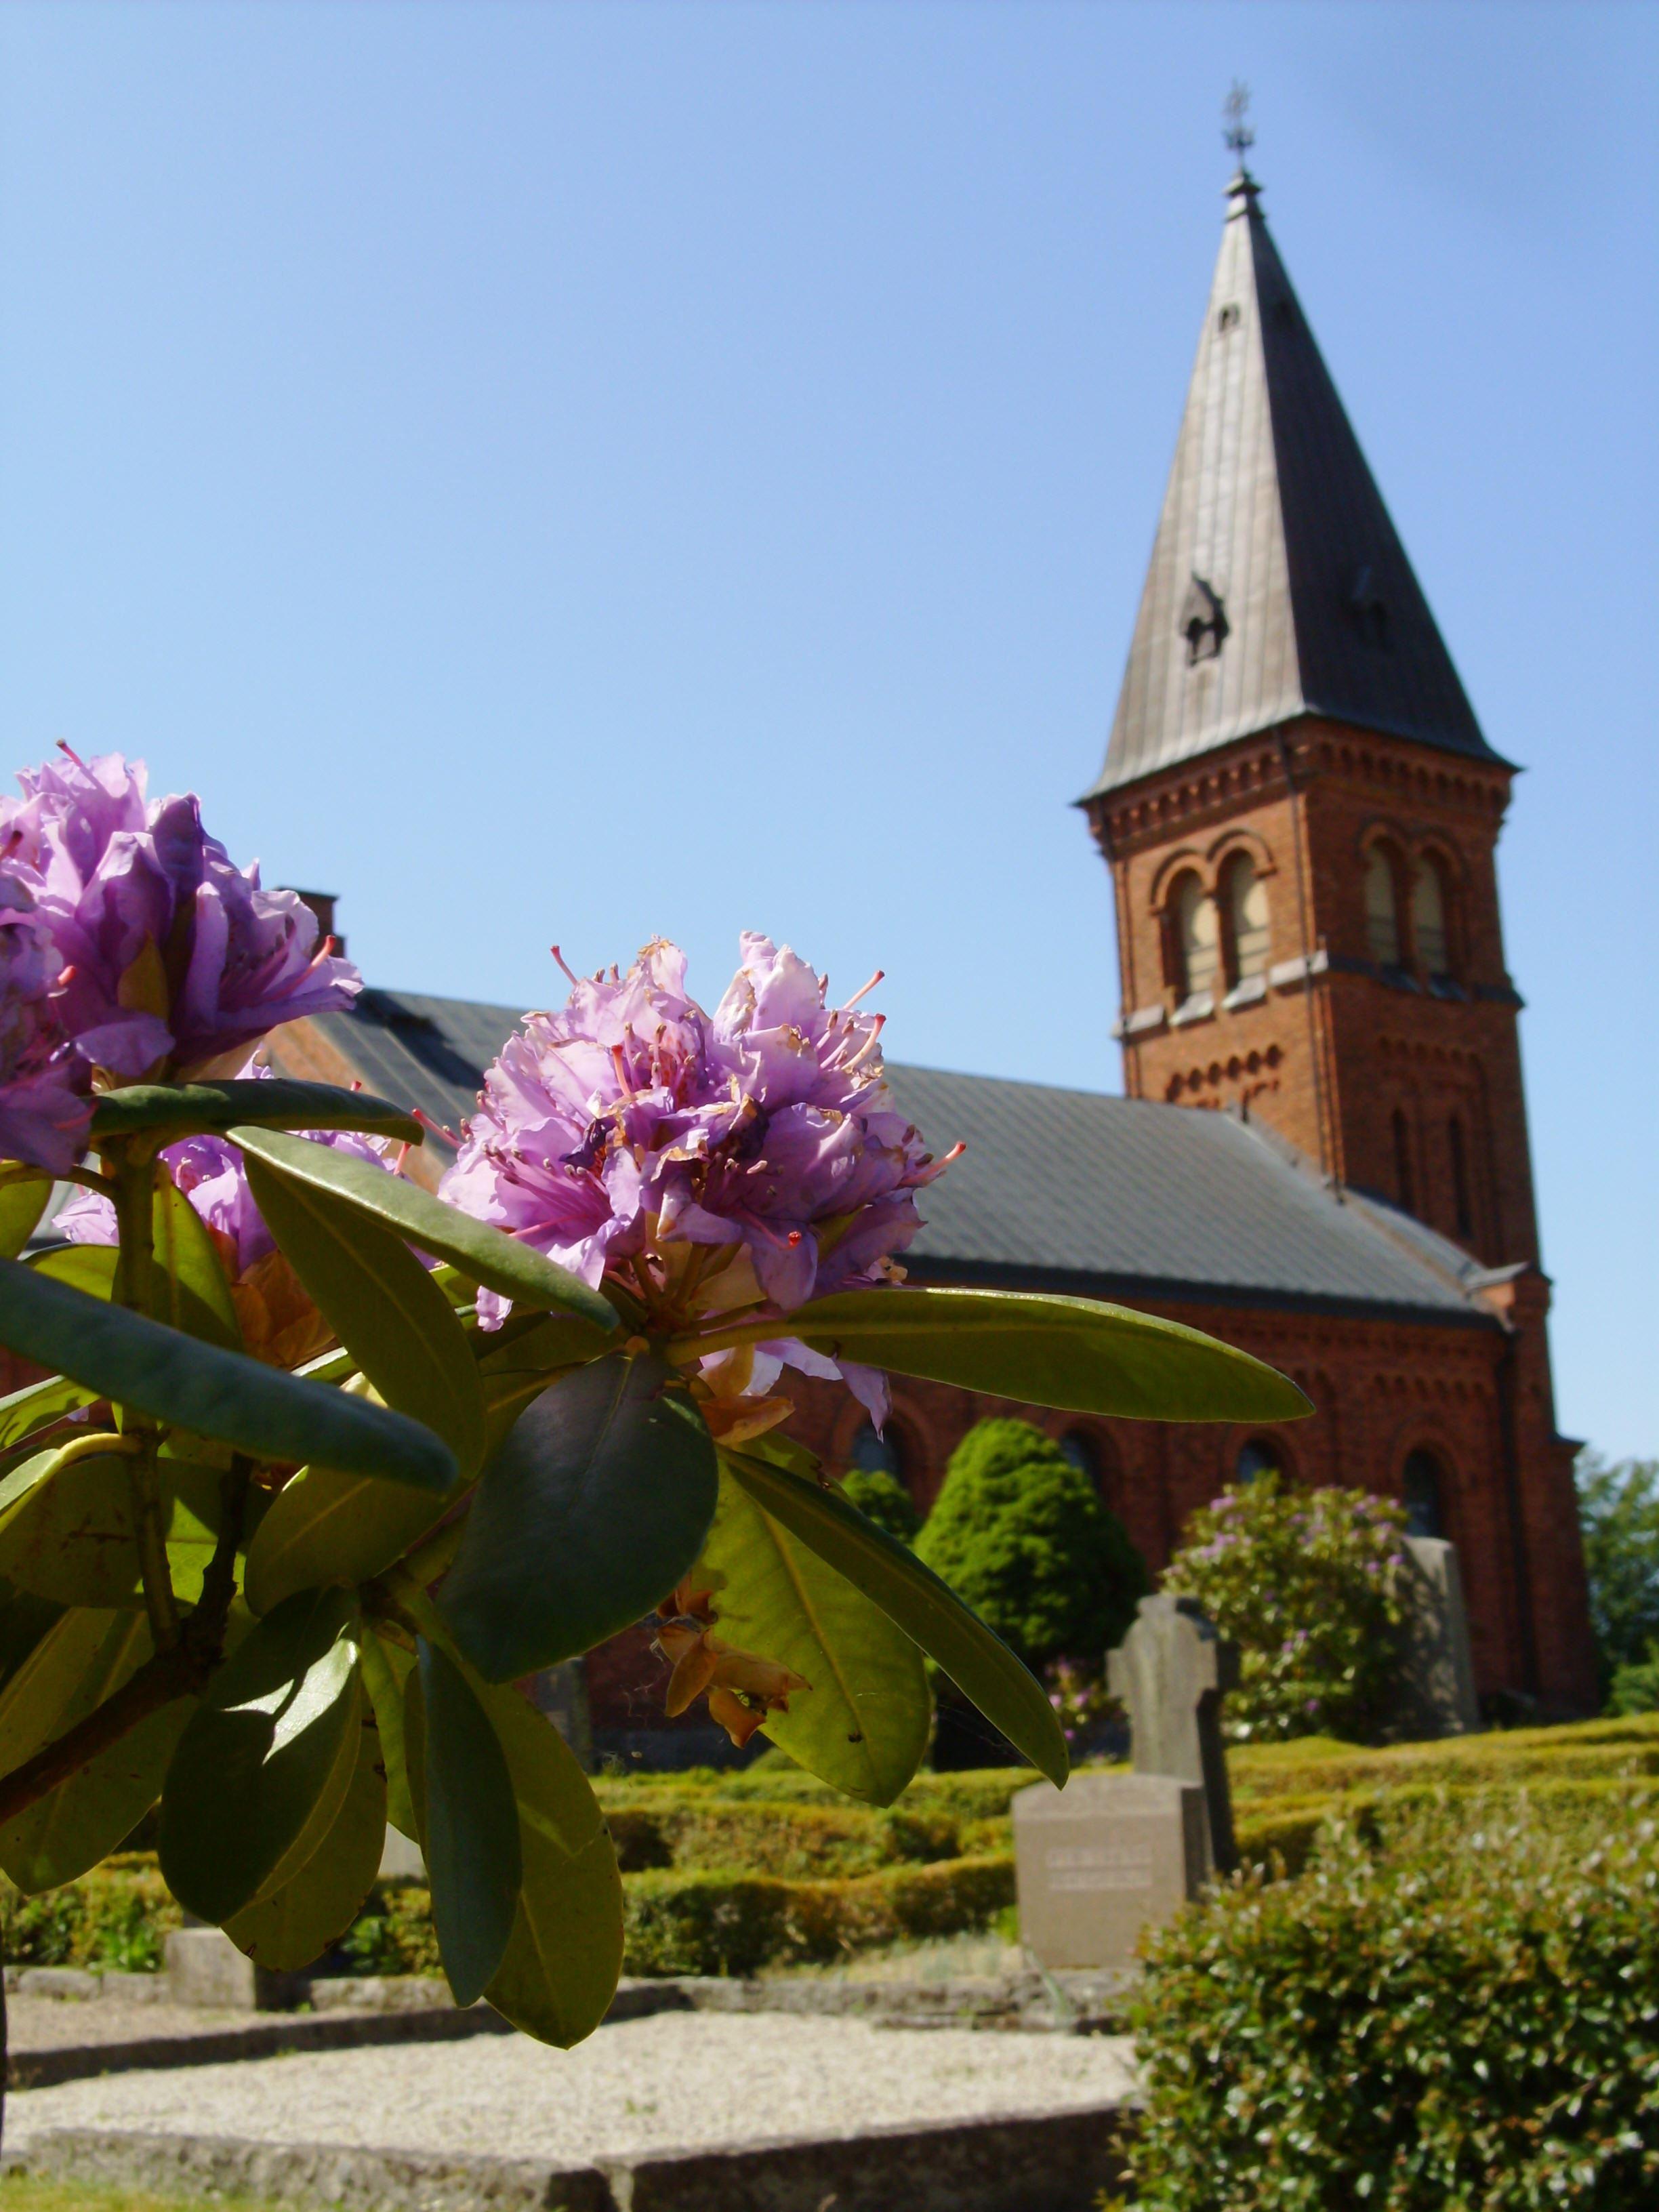 Ignaberga nya kyrka